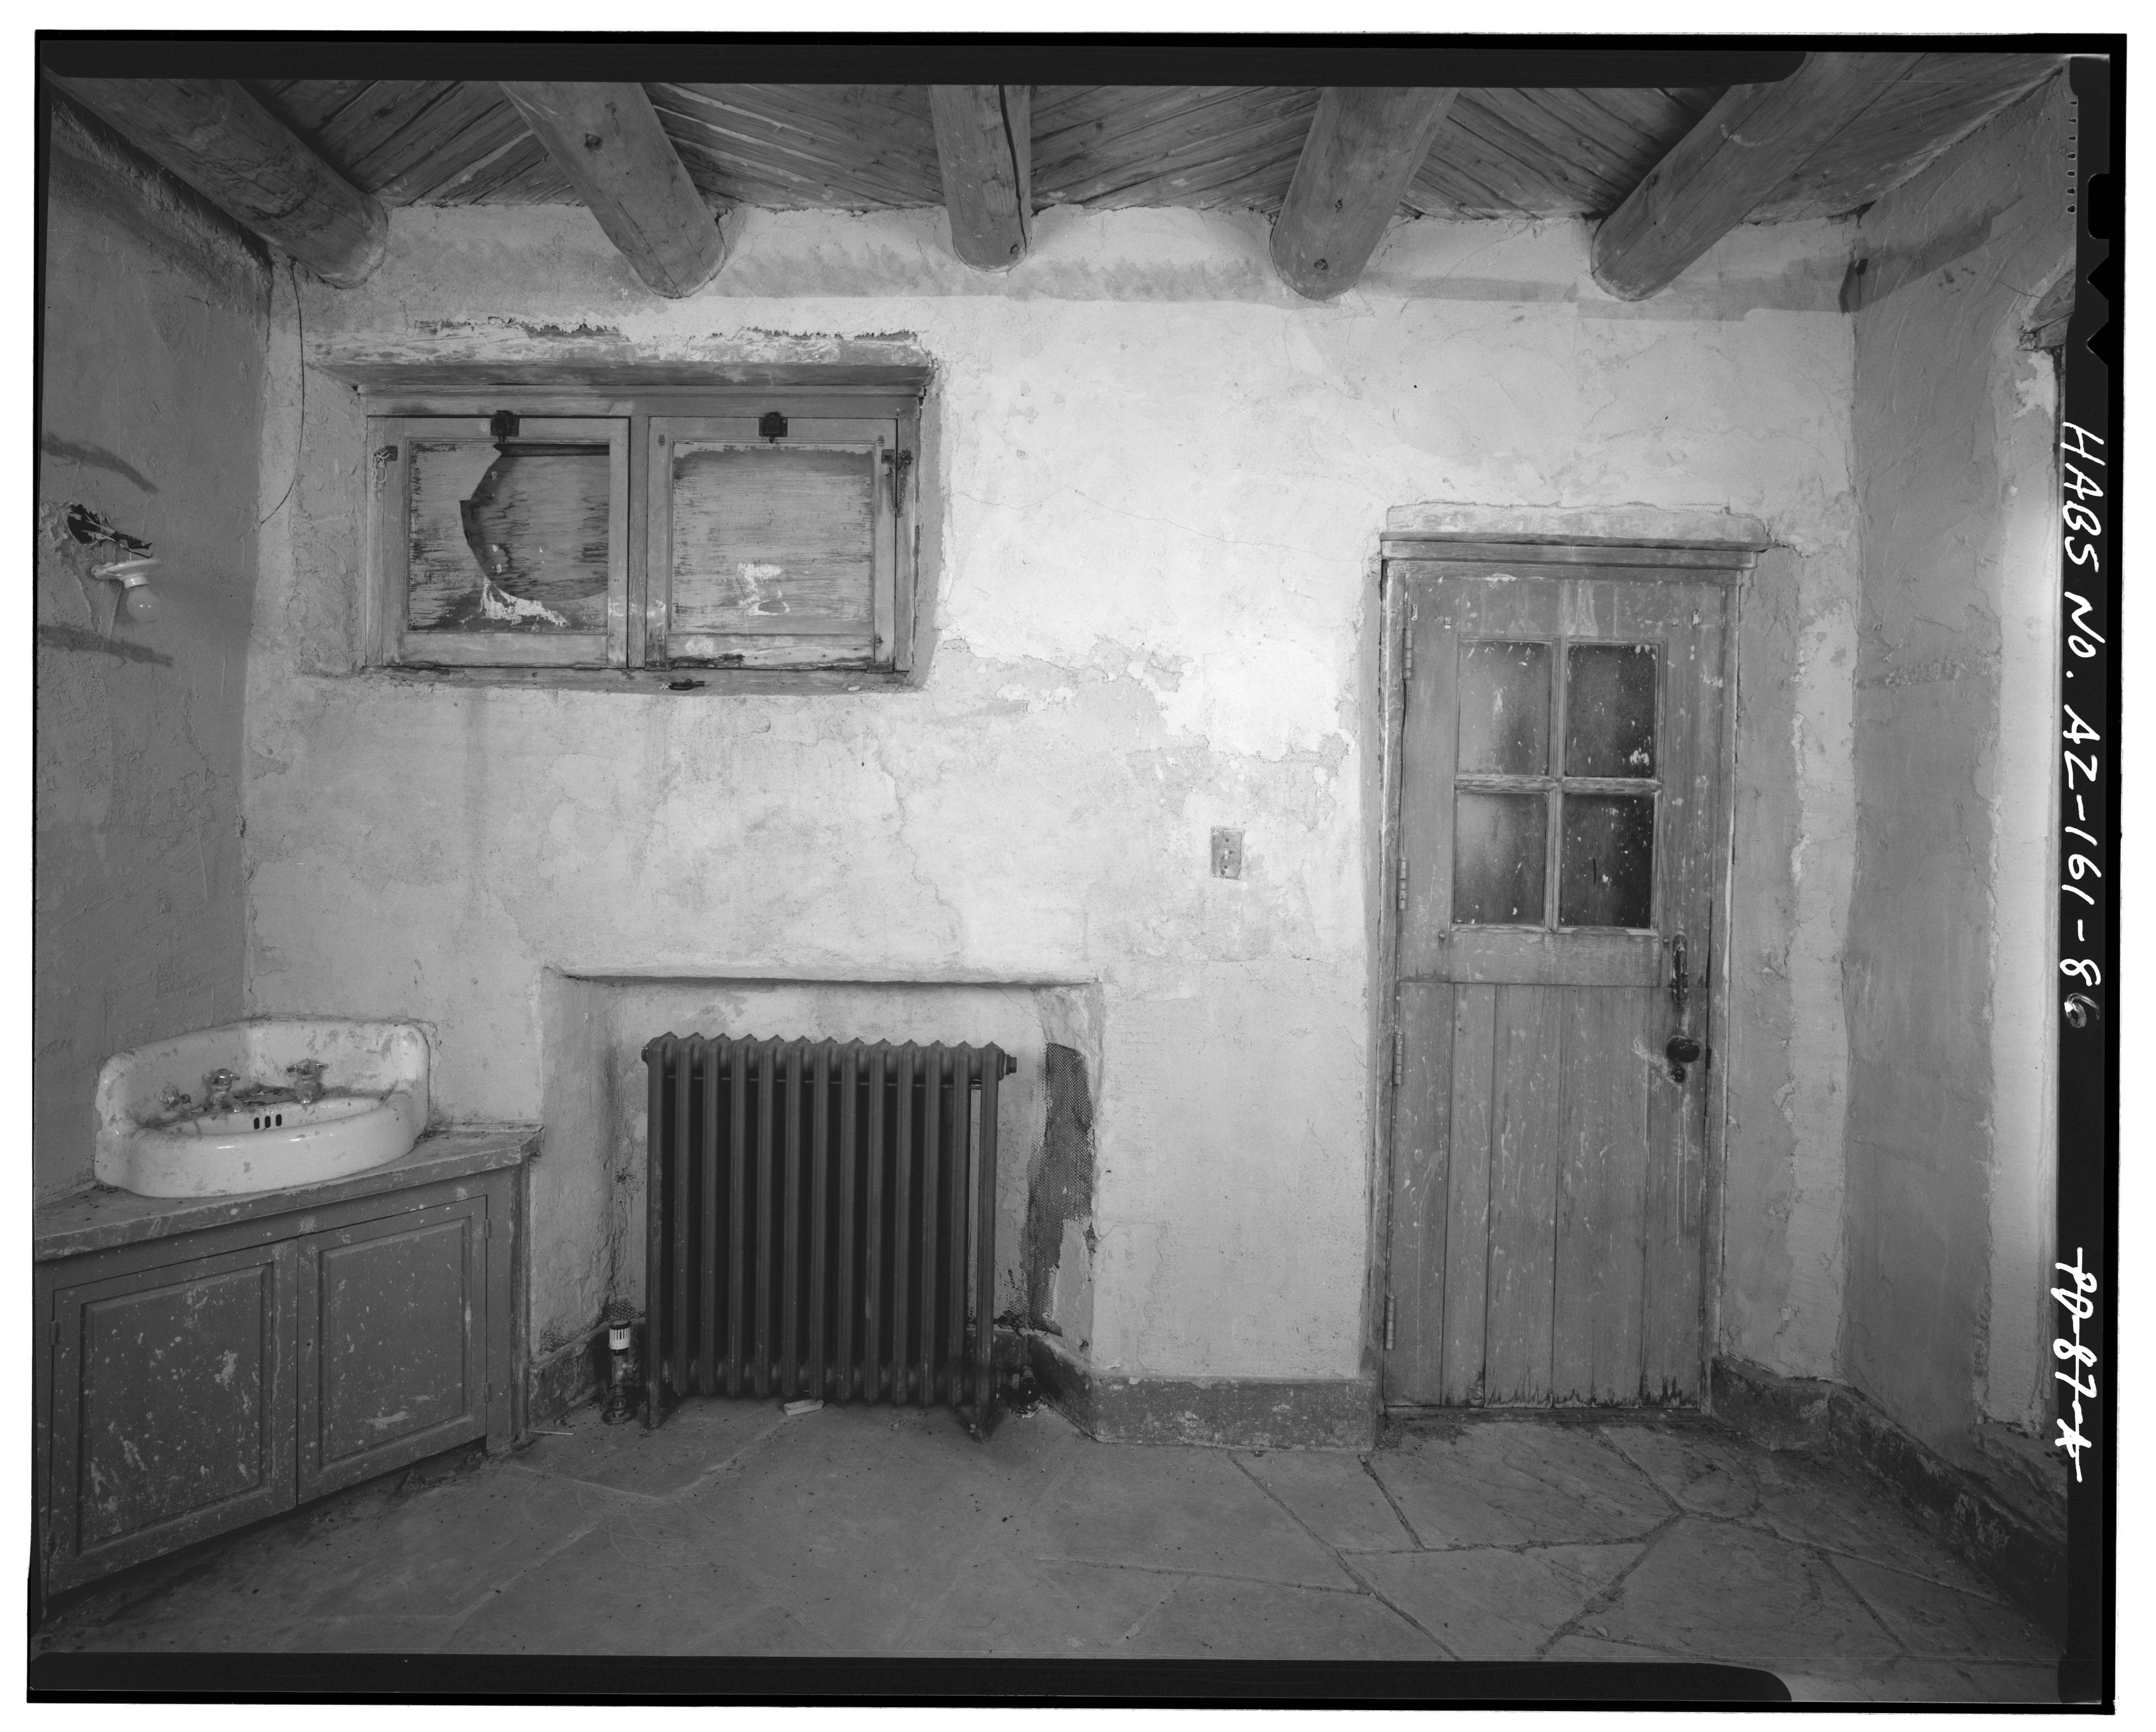 ROOM_12_WEST_WALL,_LOOKING_WEST_-_Painted_Desert_Inn,_Navajo,_Apache_County,_AZ_HABS_ARIZ,1-NAVA.V,1-86.tif